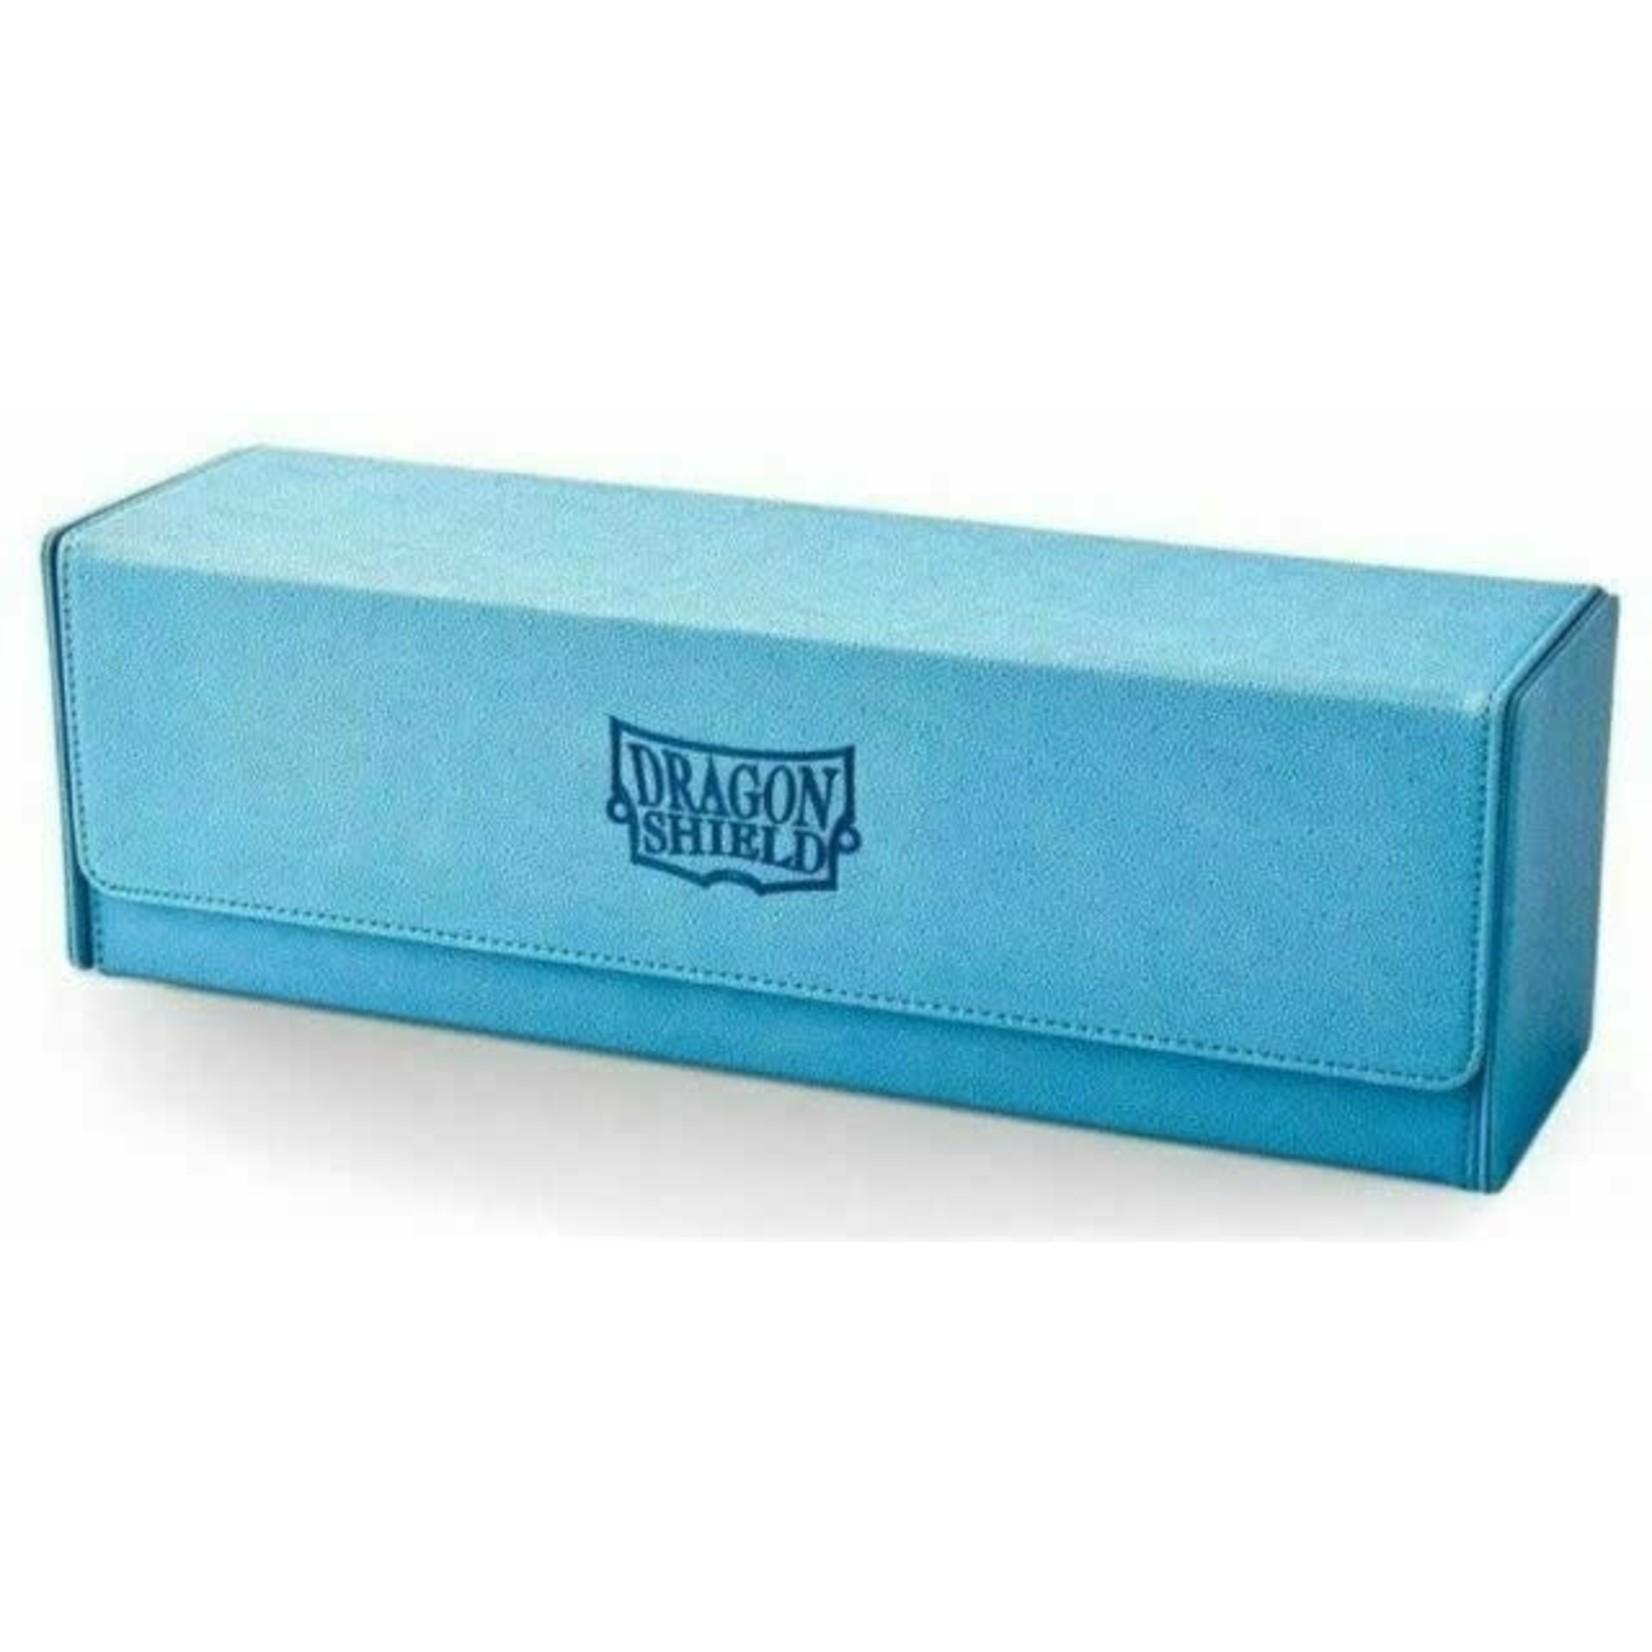 Dragon Shield Deckbox Nest 500ct: Magic Carpet Blue